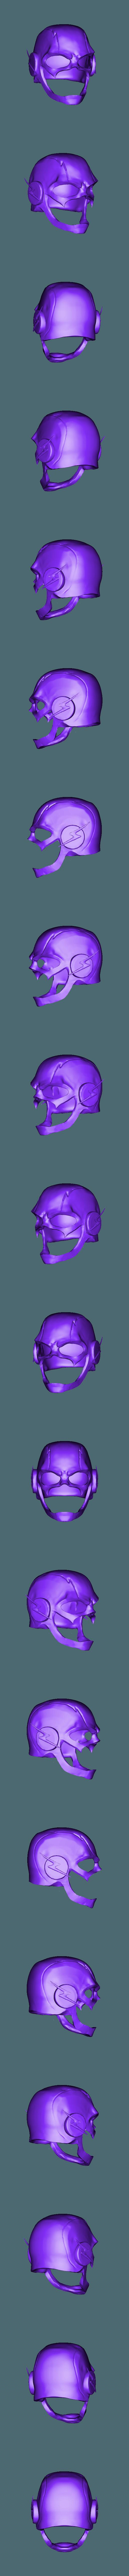 theFlashv1.stl Download free STL file the Flash helmet • 3D printable object, thePixelsChips